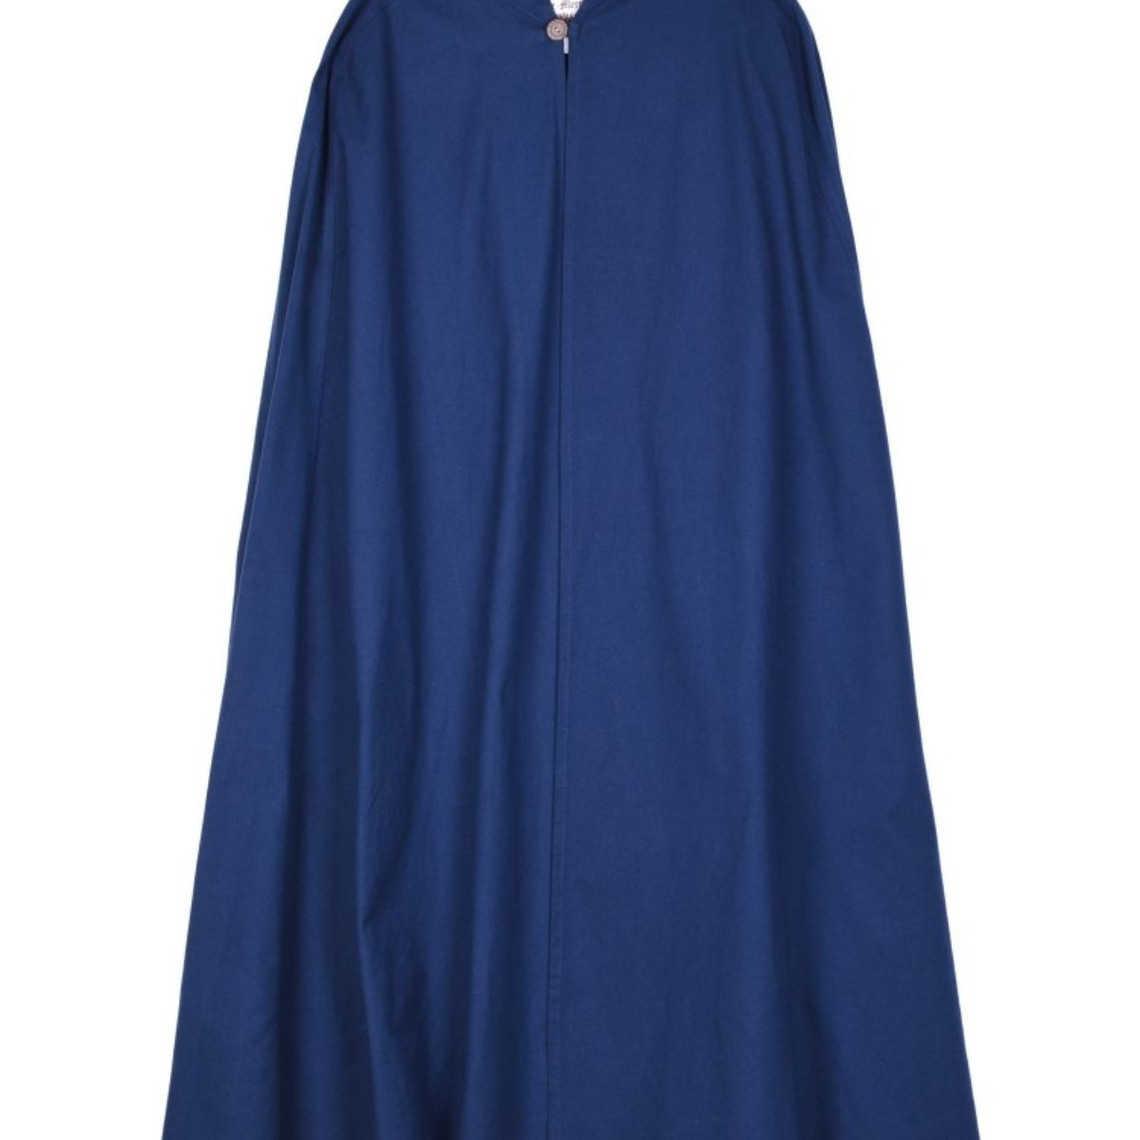 Capa de algodón Ellyn, azul